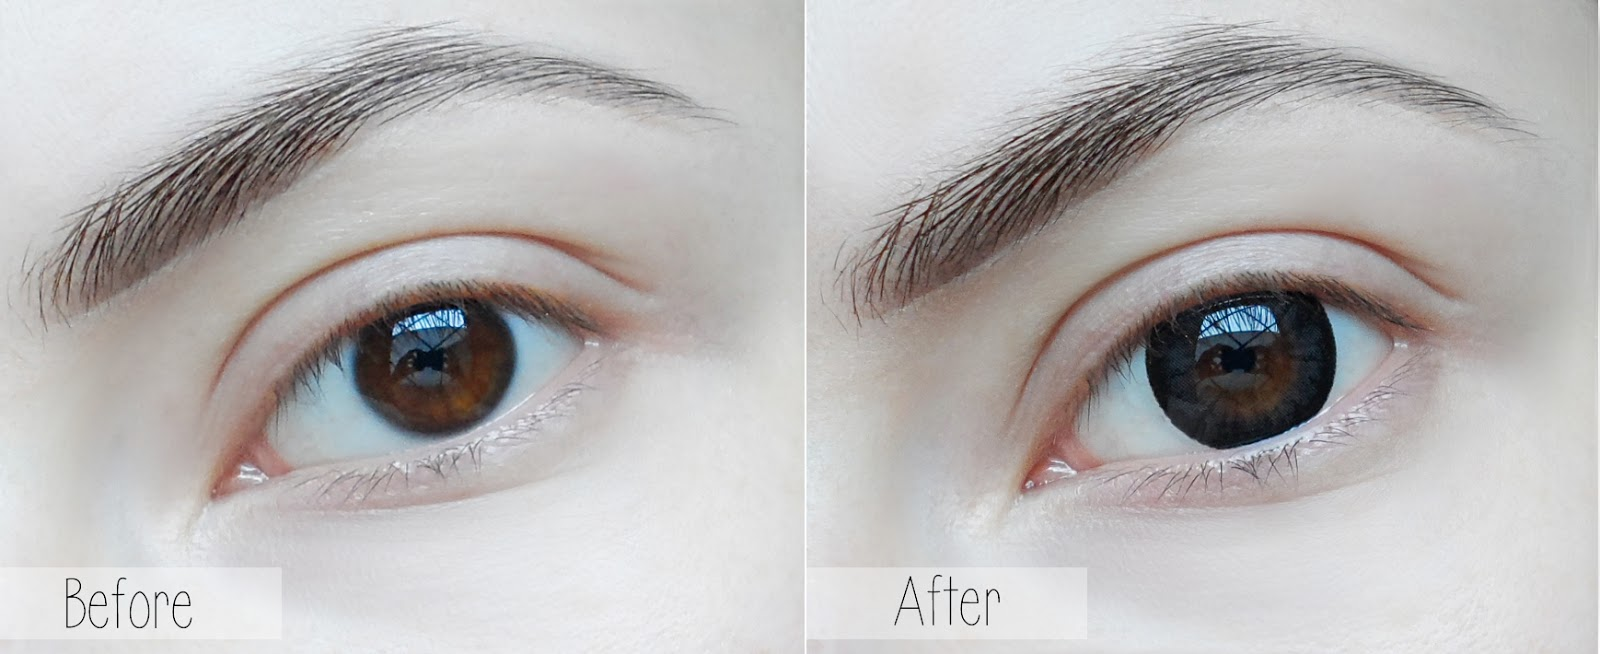 circle color lens blogger review enlarging eyes doll eyes anime eyes liz breygel blogger review